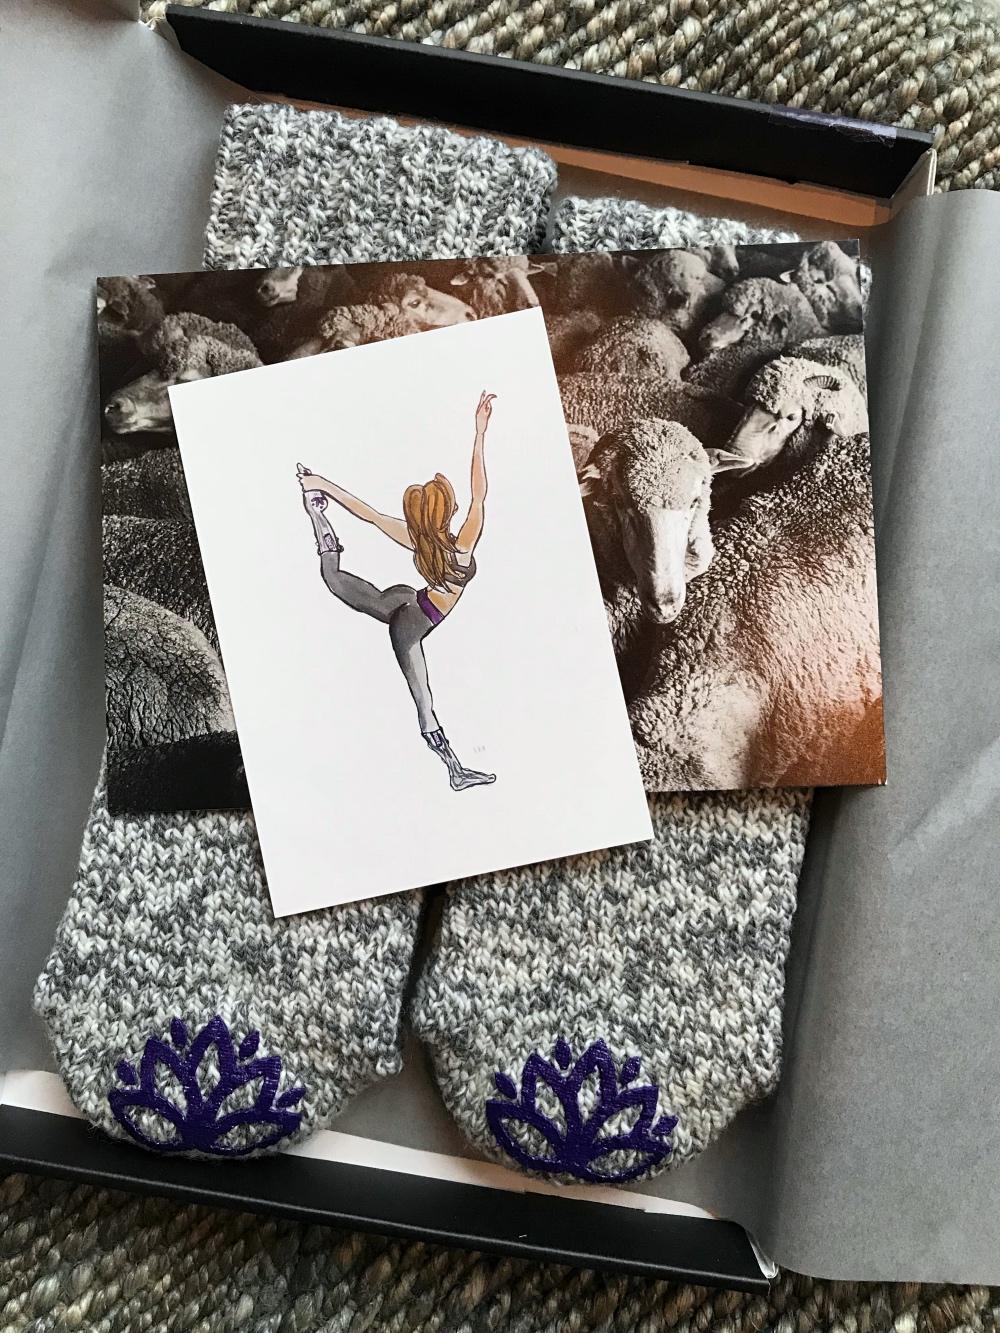 Yoga sokken van Soxs